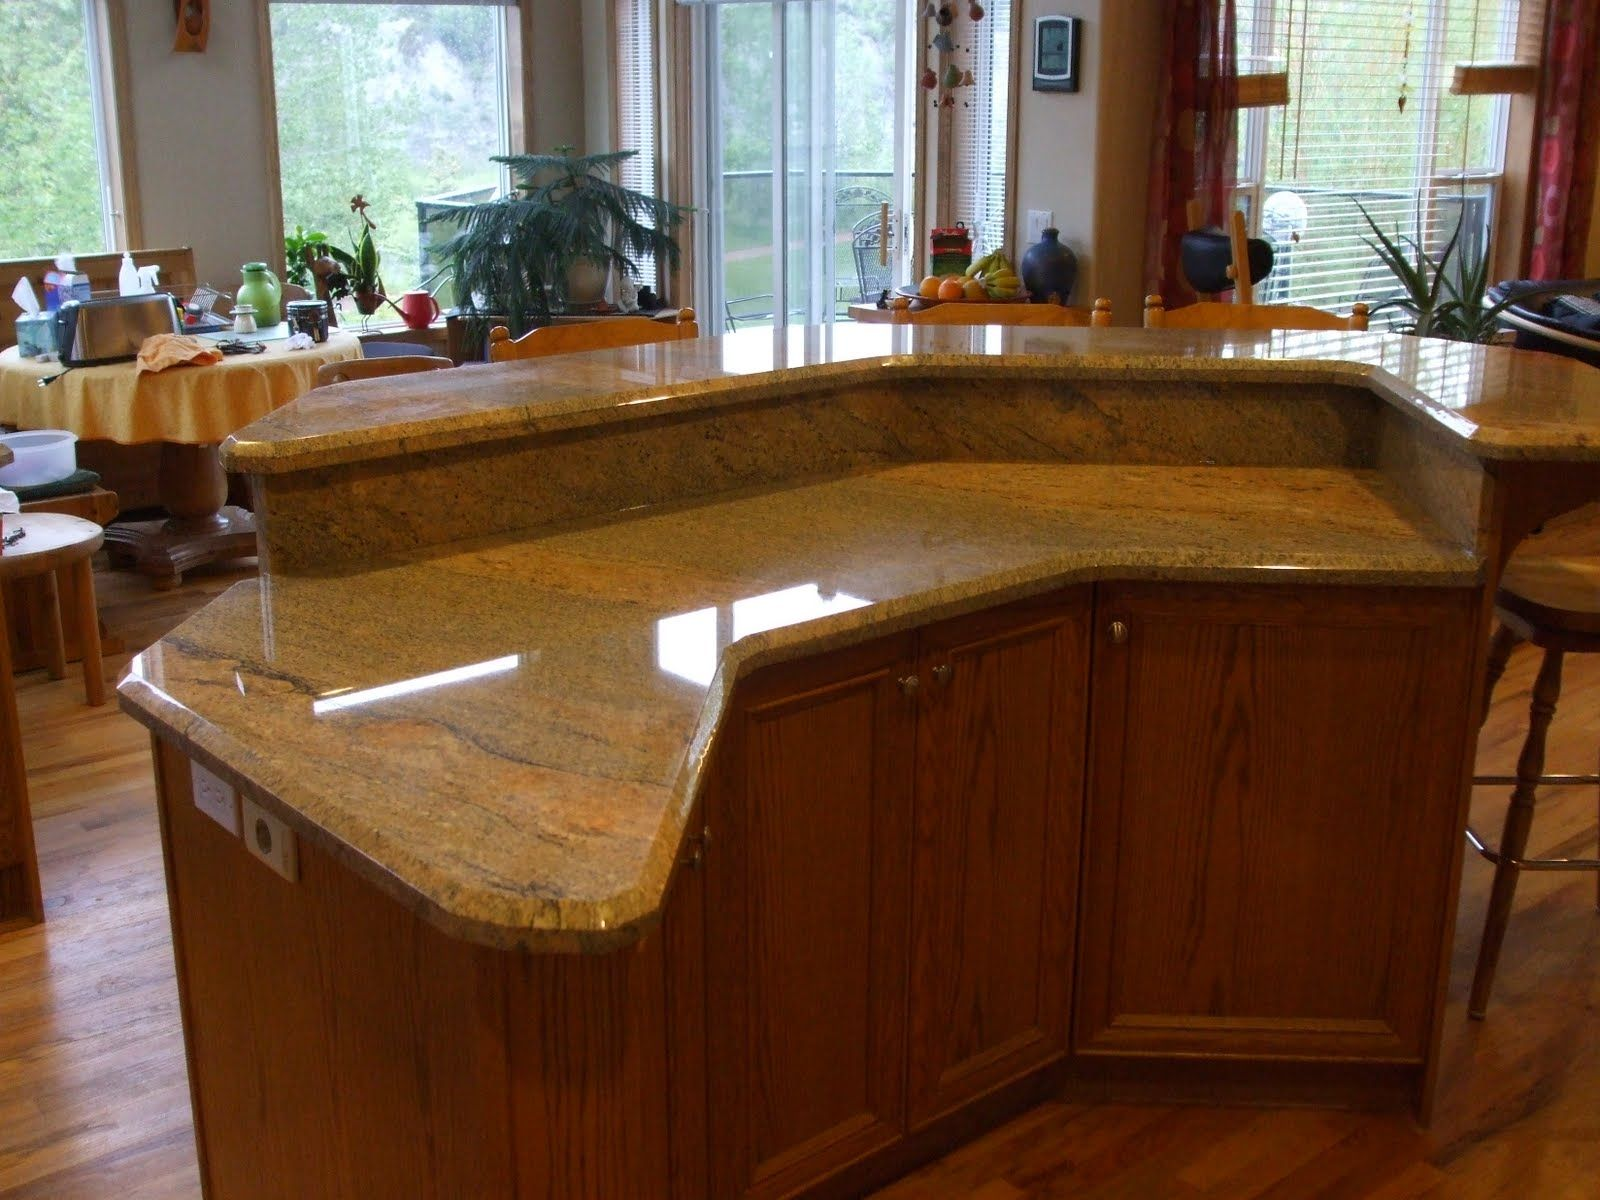 quartz countertops calgary kitchen countertops quartz 10 Best Images About Kitchen Counter Tops Makeover On Pinterest